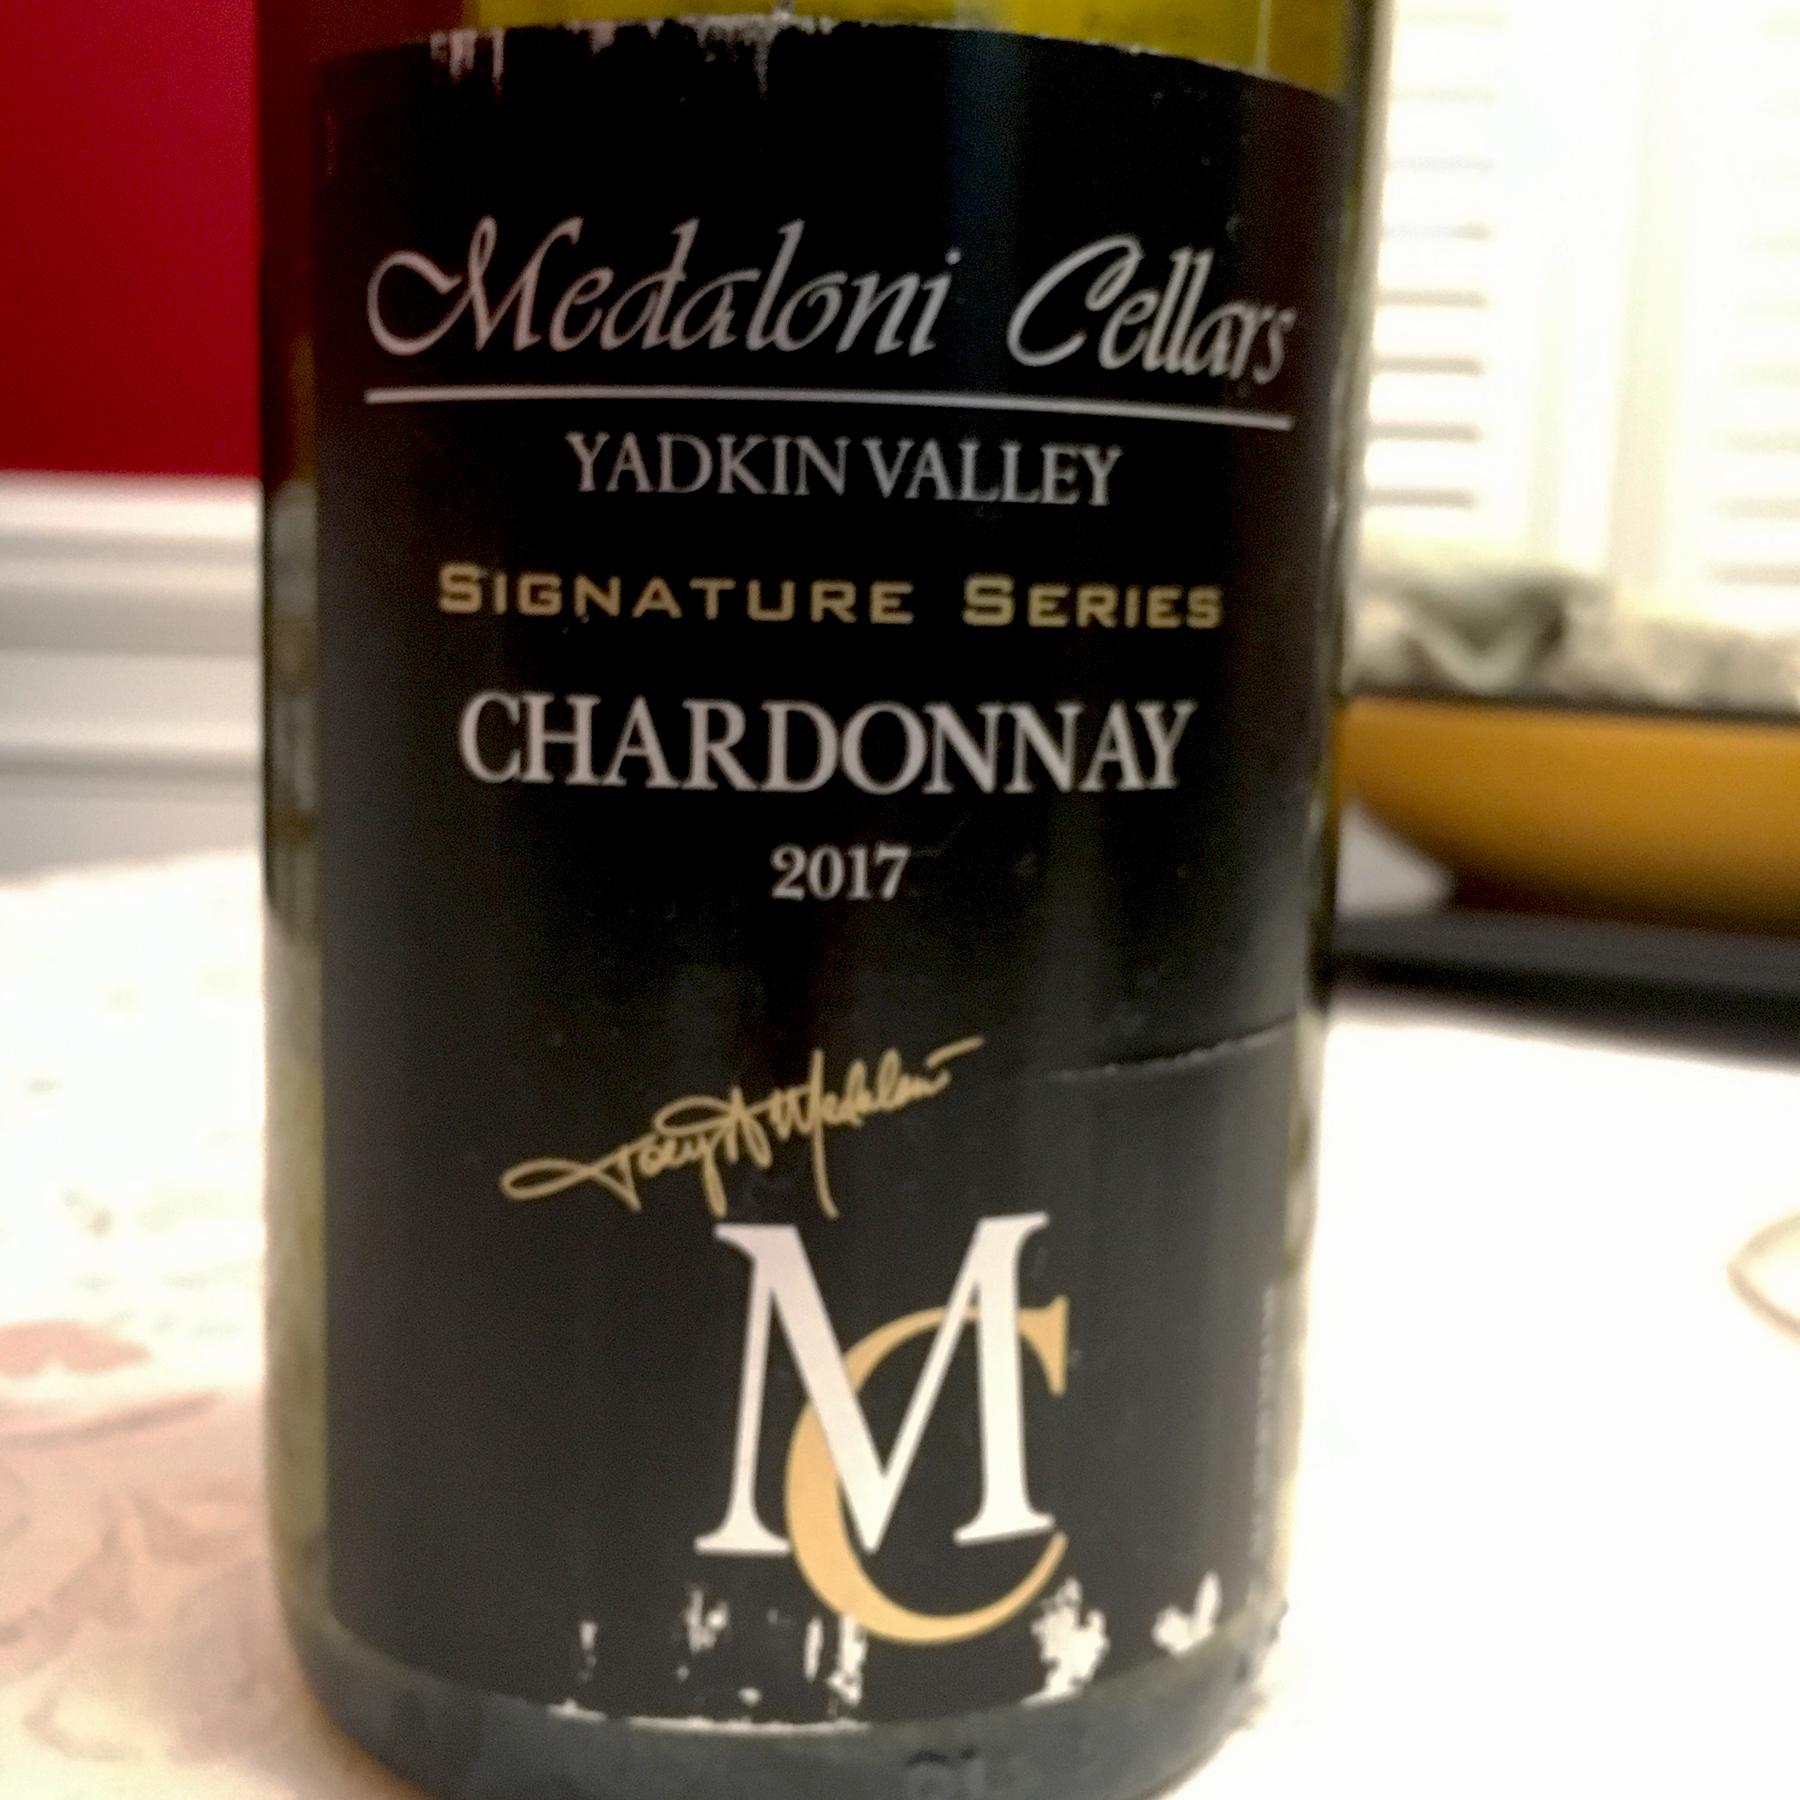 Medaloni Cellars_Chardonnay.JPG